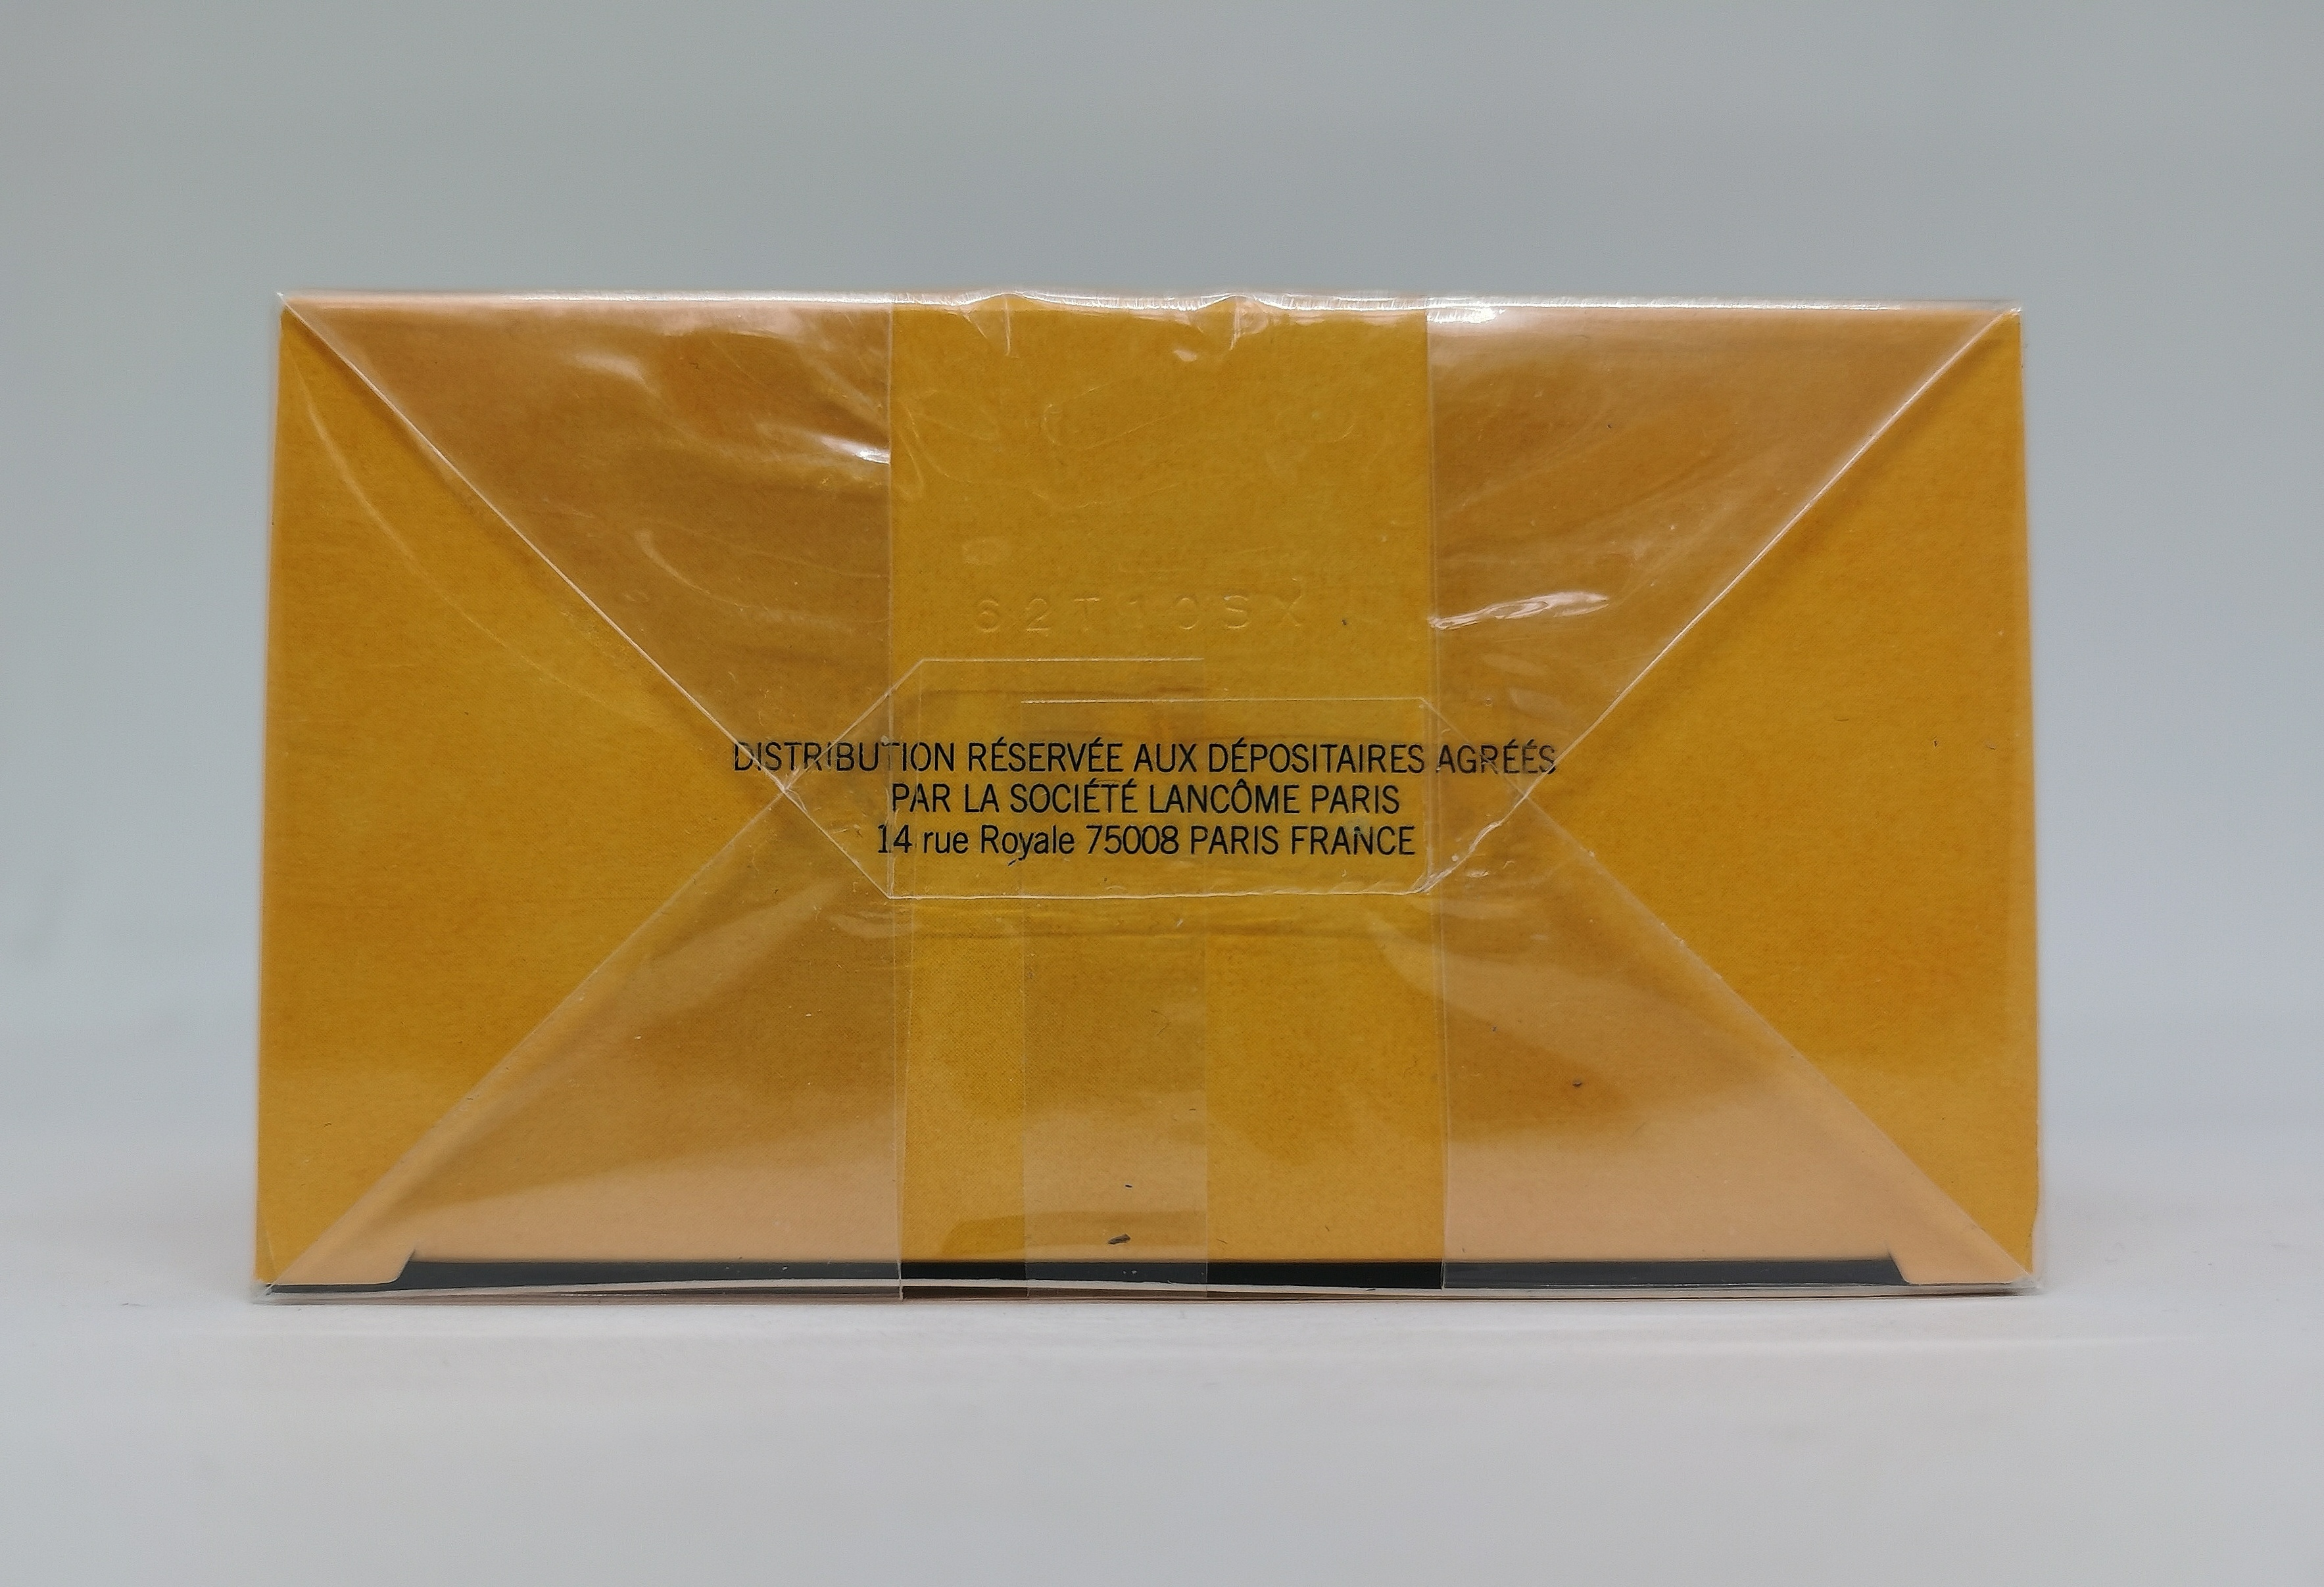 Парфюмерная вода 100 мл Lancome Poeme - фото батч-кода на коробке